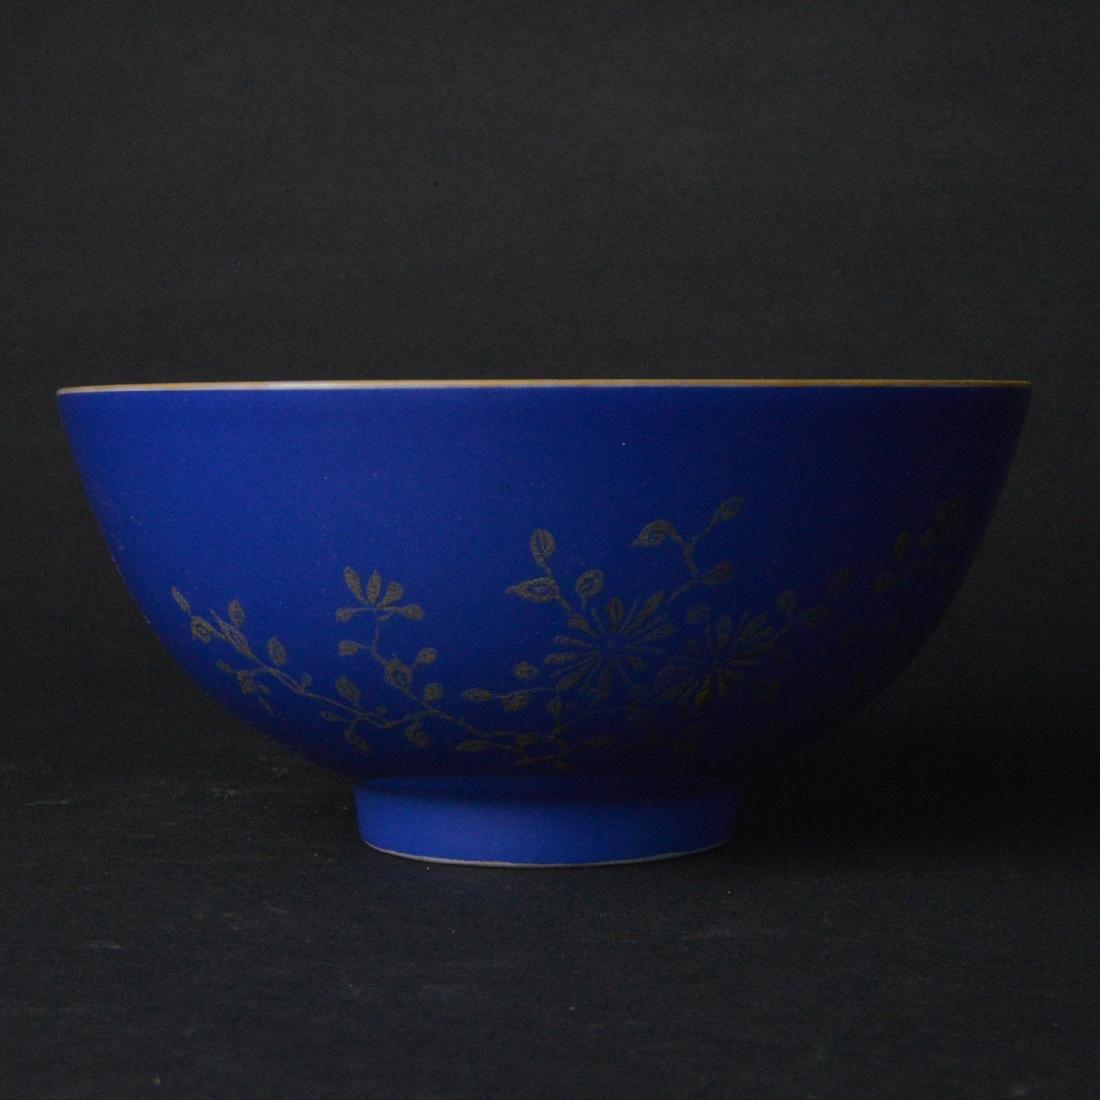 CHINESE BLUE PORCELAIN BOWL